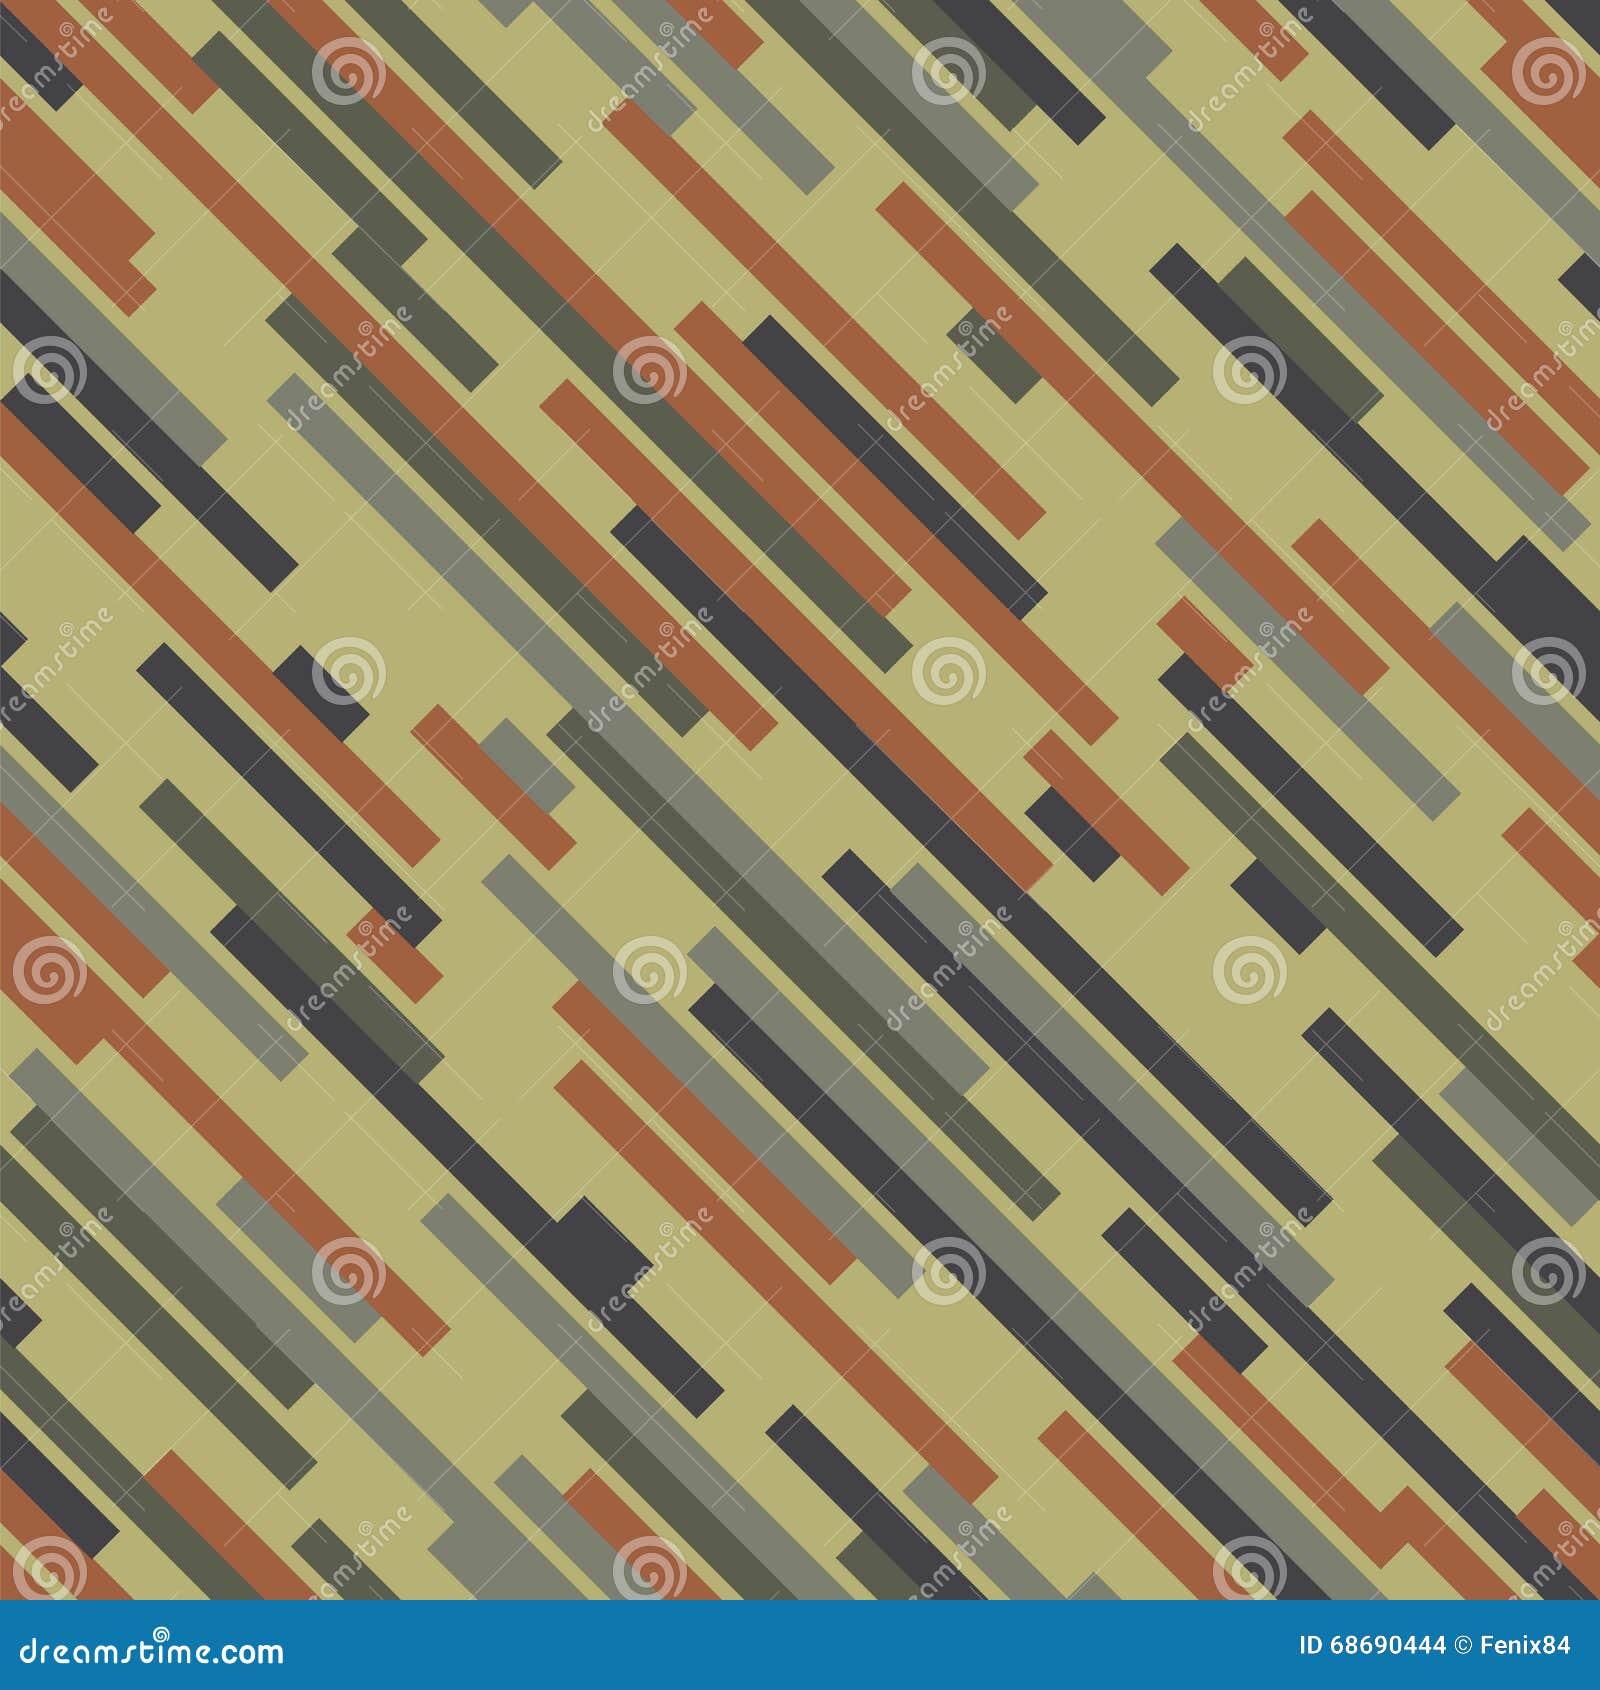 Digital-Tarnung Hölzerne Farbe Nahtloses vektormuster